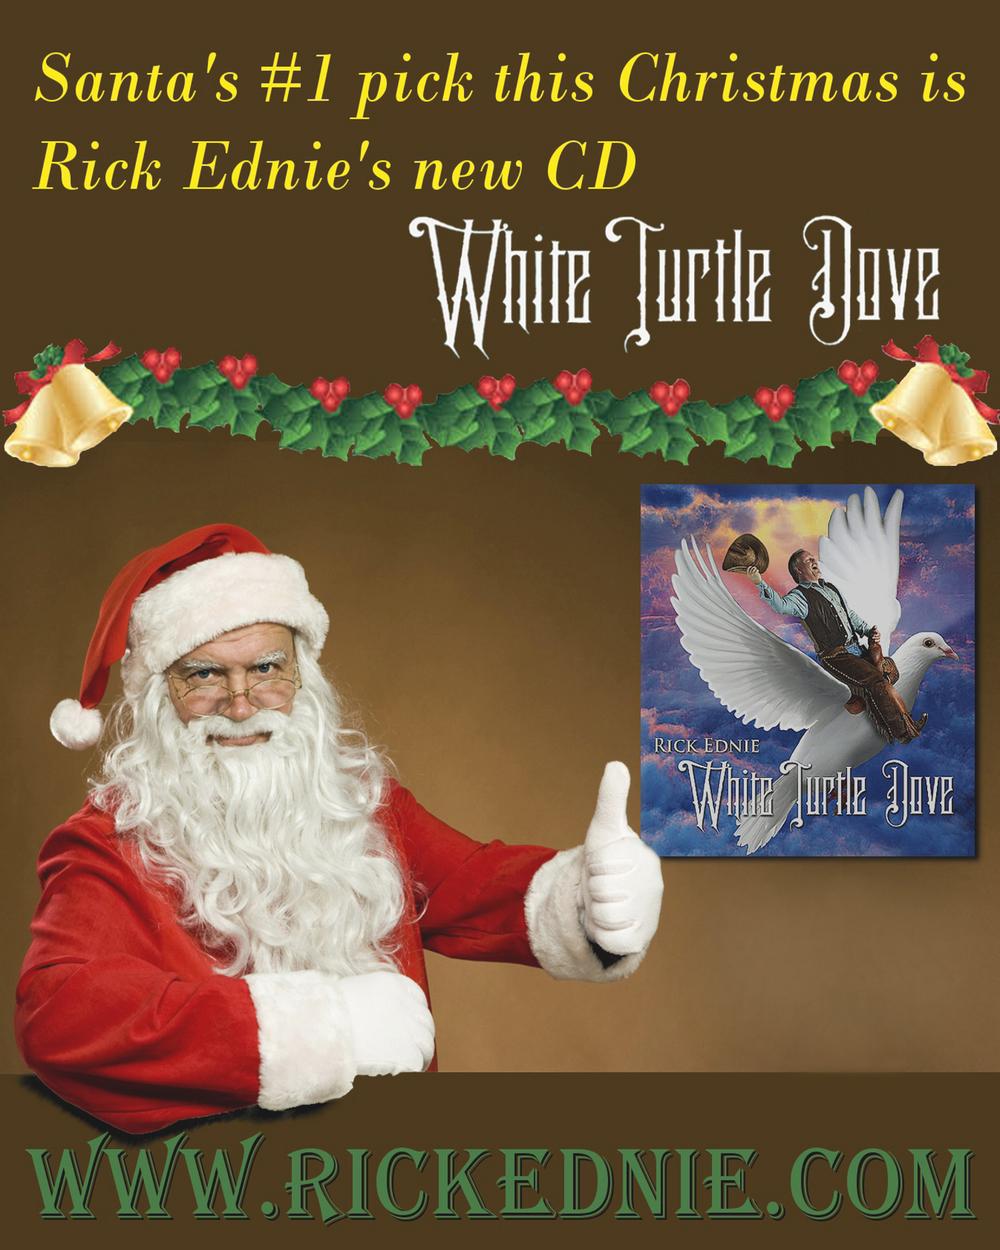 Rick Ednie_December BB Ad_5.0 x 6.25.jpg